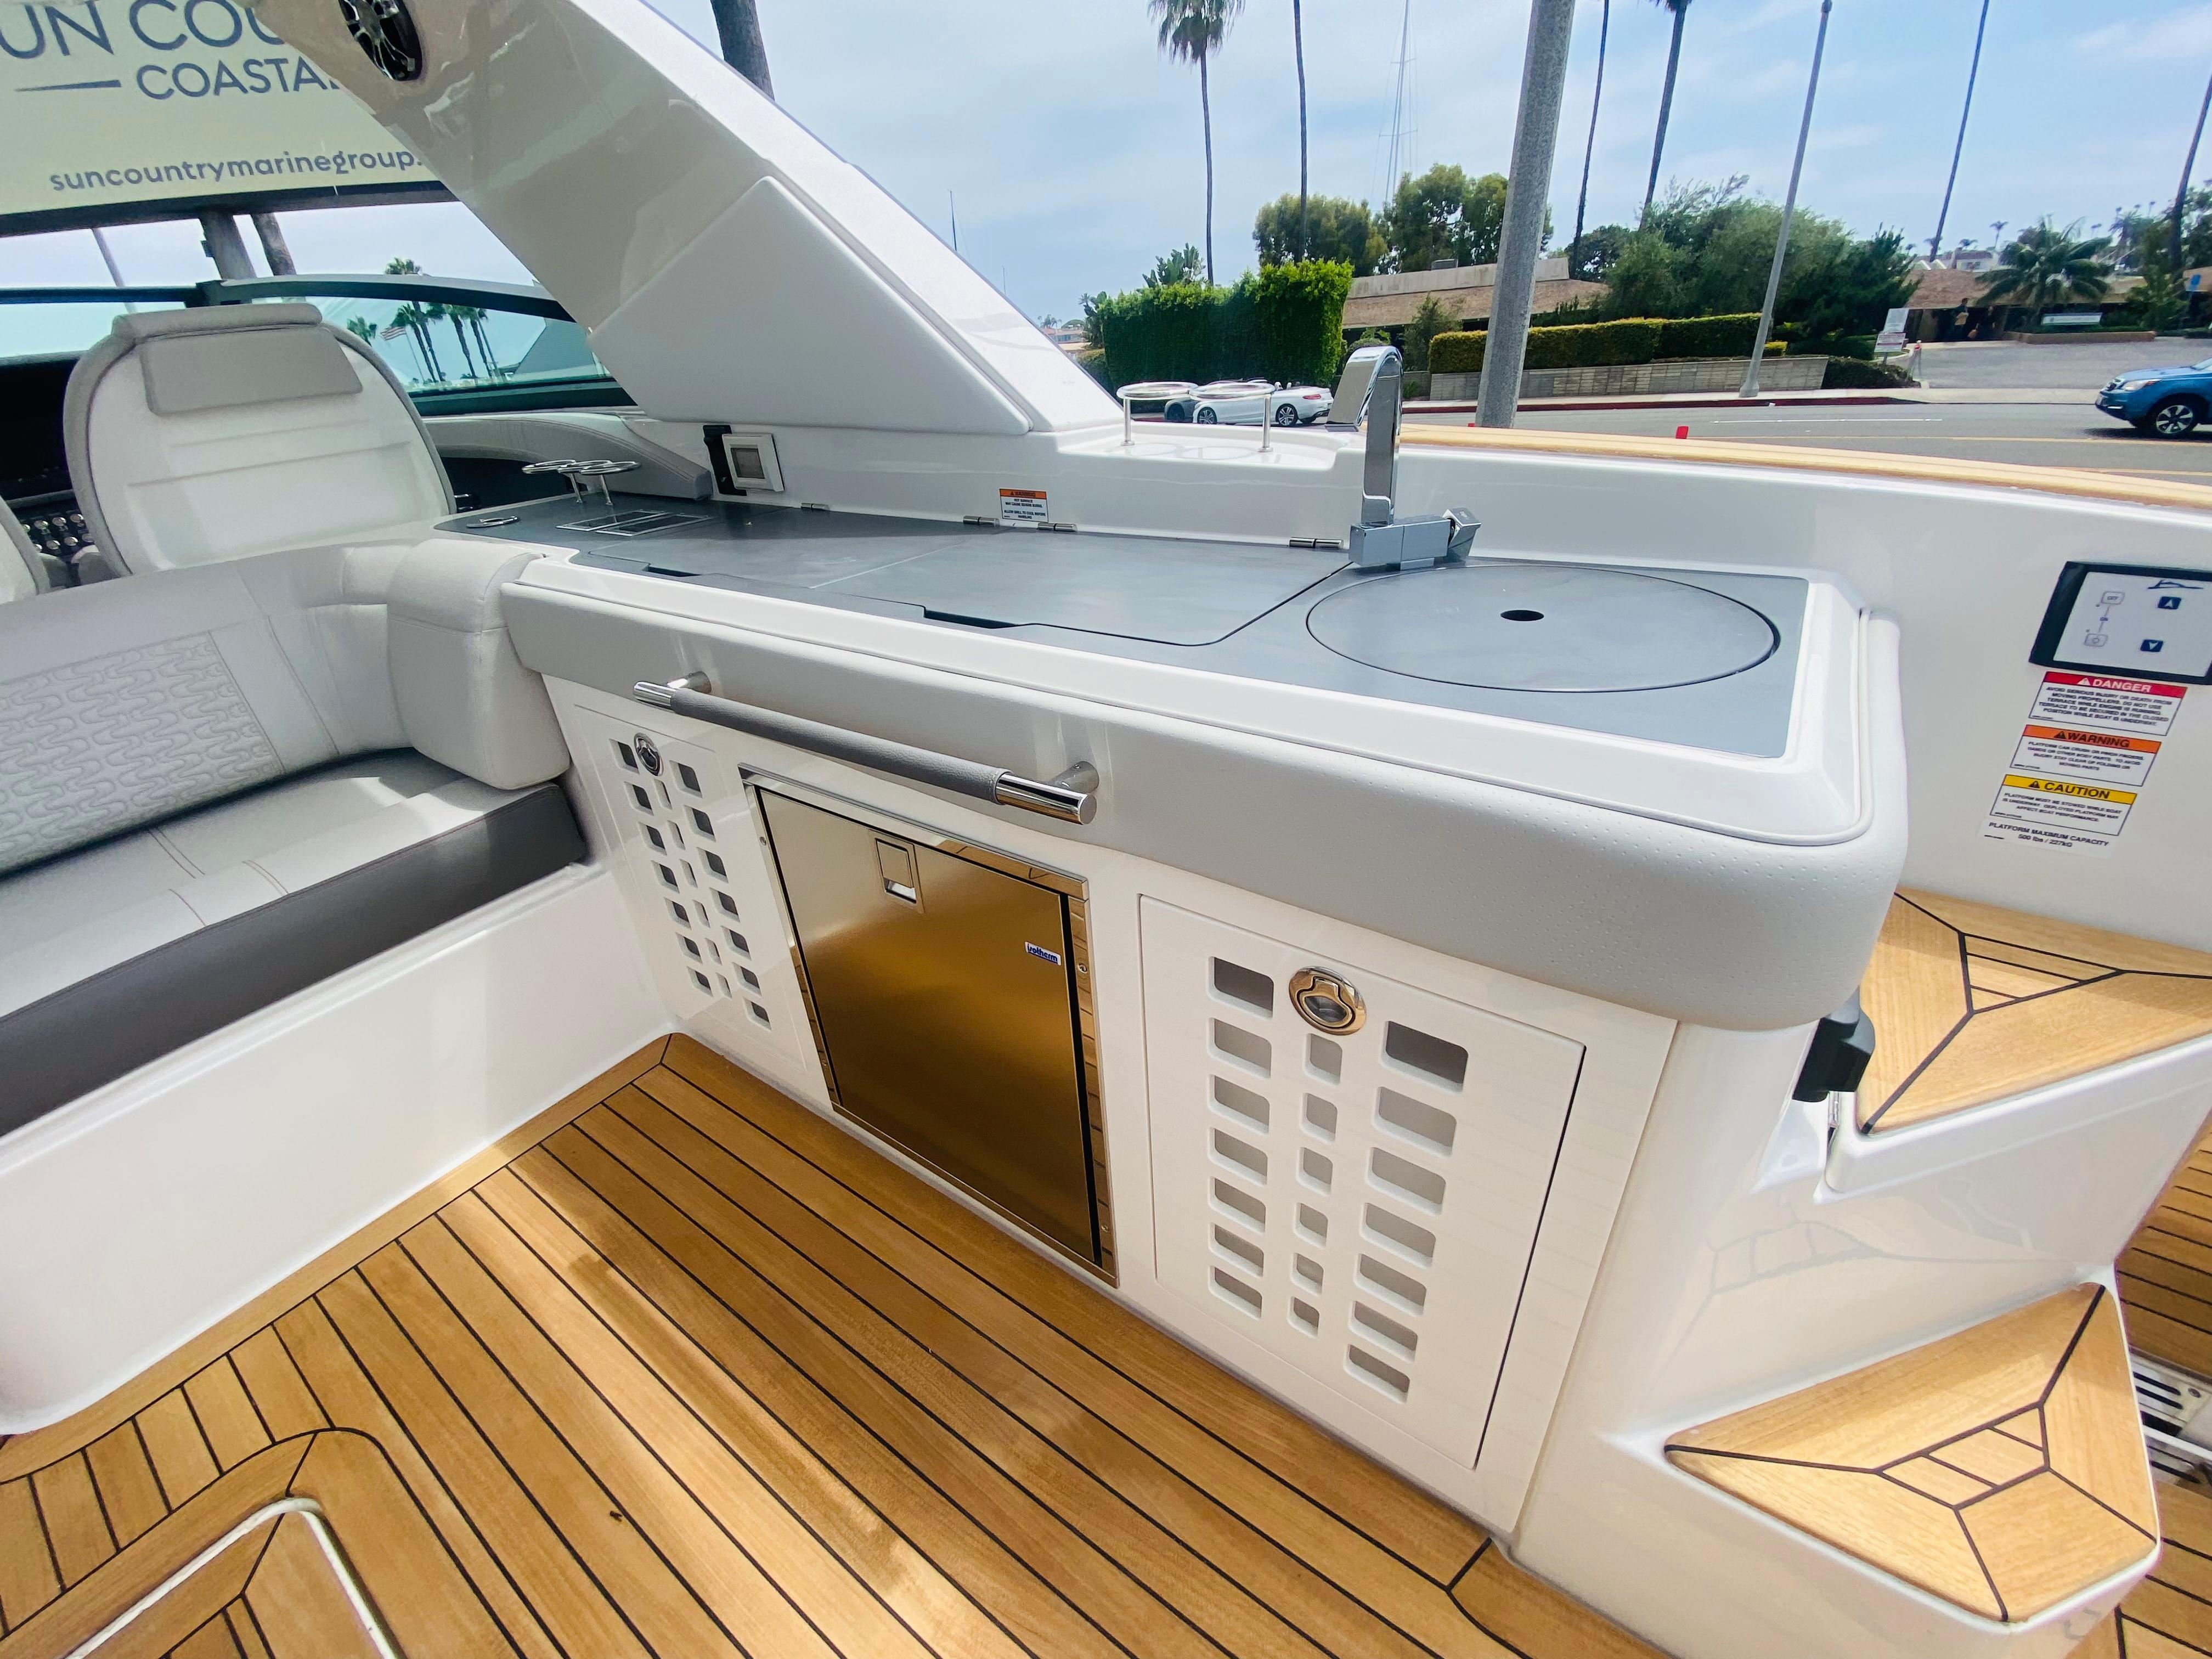 2022 Sea Ray SLX 400 #S1401F inventory image at Sun Country Coastal in Newport Beach